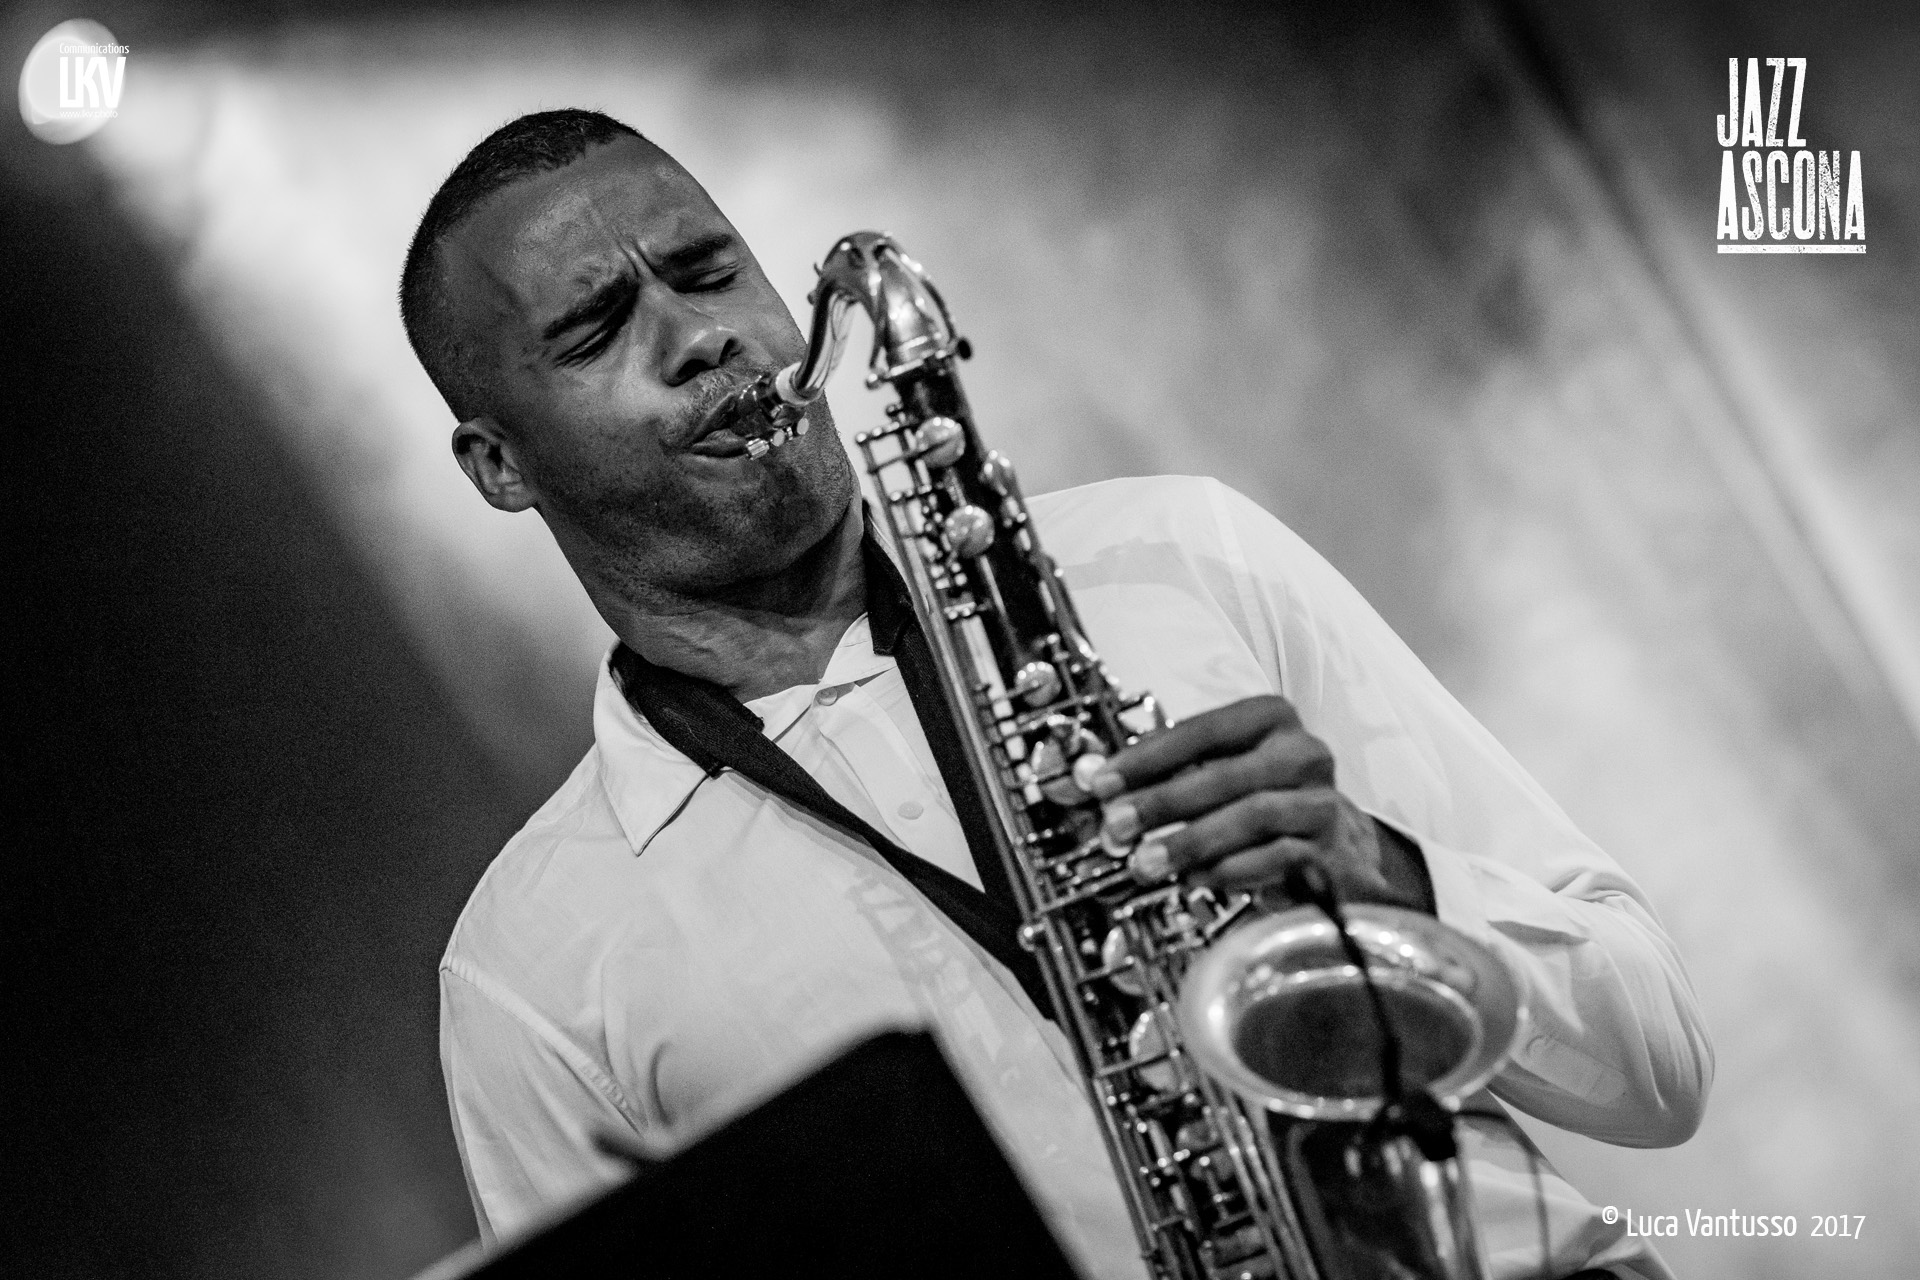 Luca Vantusso</br> Festival Jazz di Ascona parte 2</br> Reportage